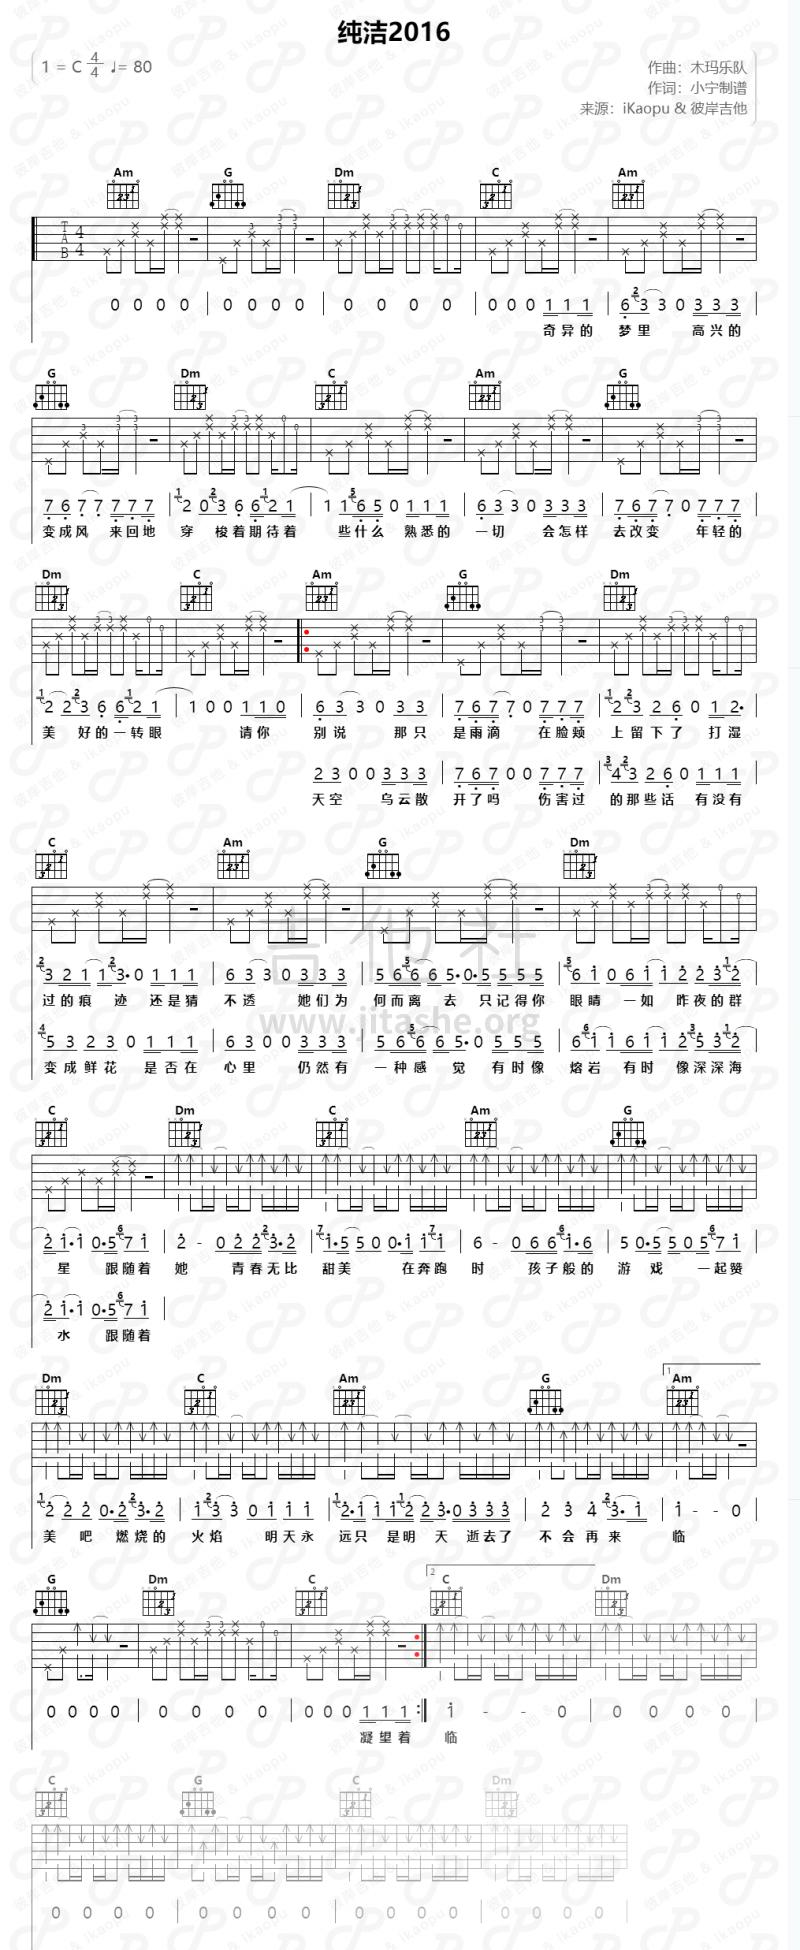 纯洁2016吉他谱(图片谱)_木马(muma)_205ed2d39af28ad914db431303d0bff5a9477cccf9f1dc864.PNG